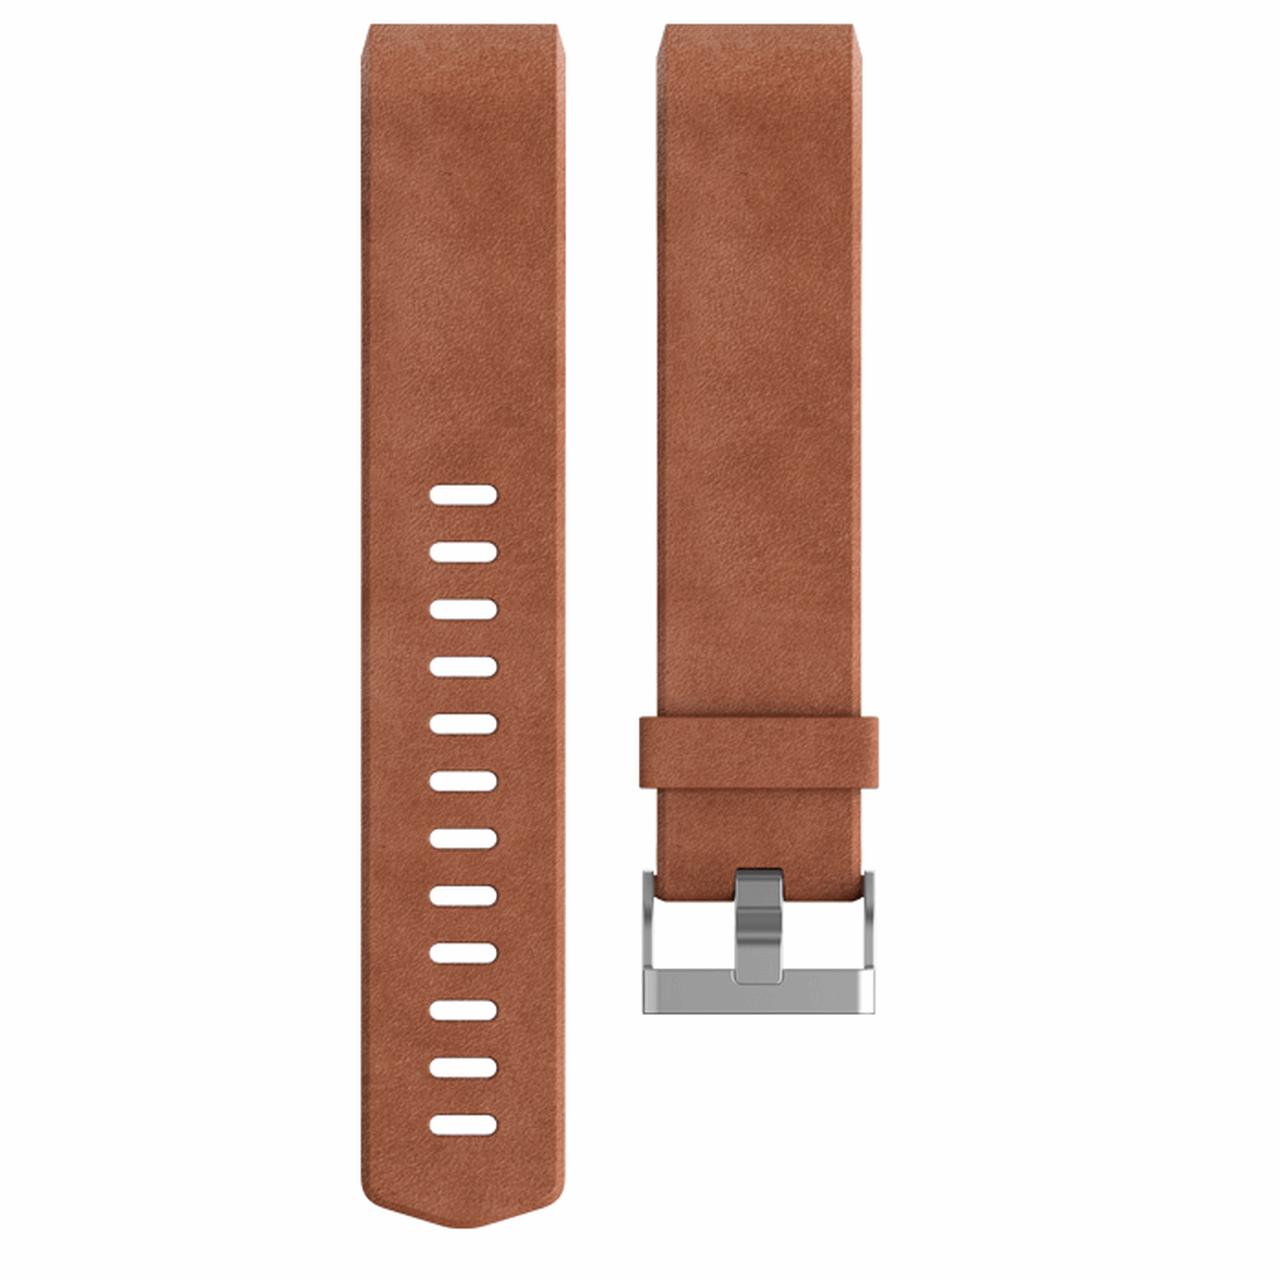 بند مچ بند هوشمند فیت بیت مدل Charge 2 Leather سایز کوچک